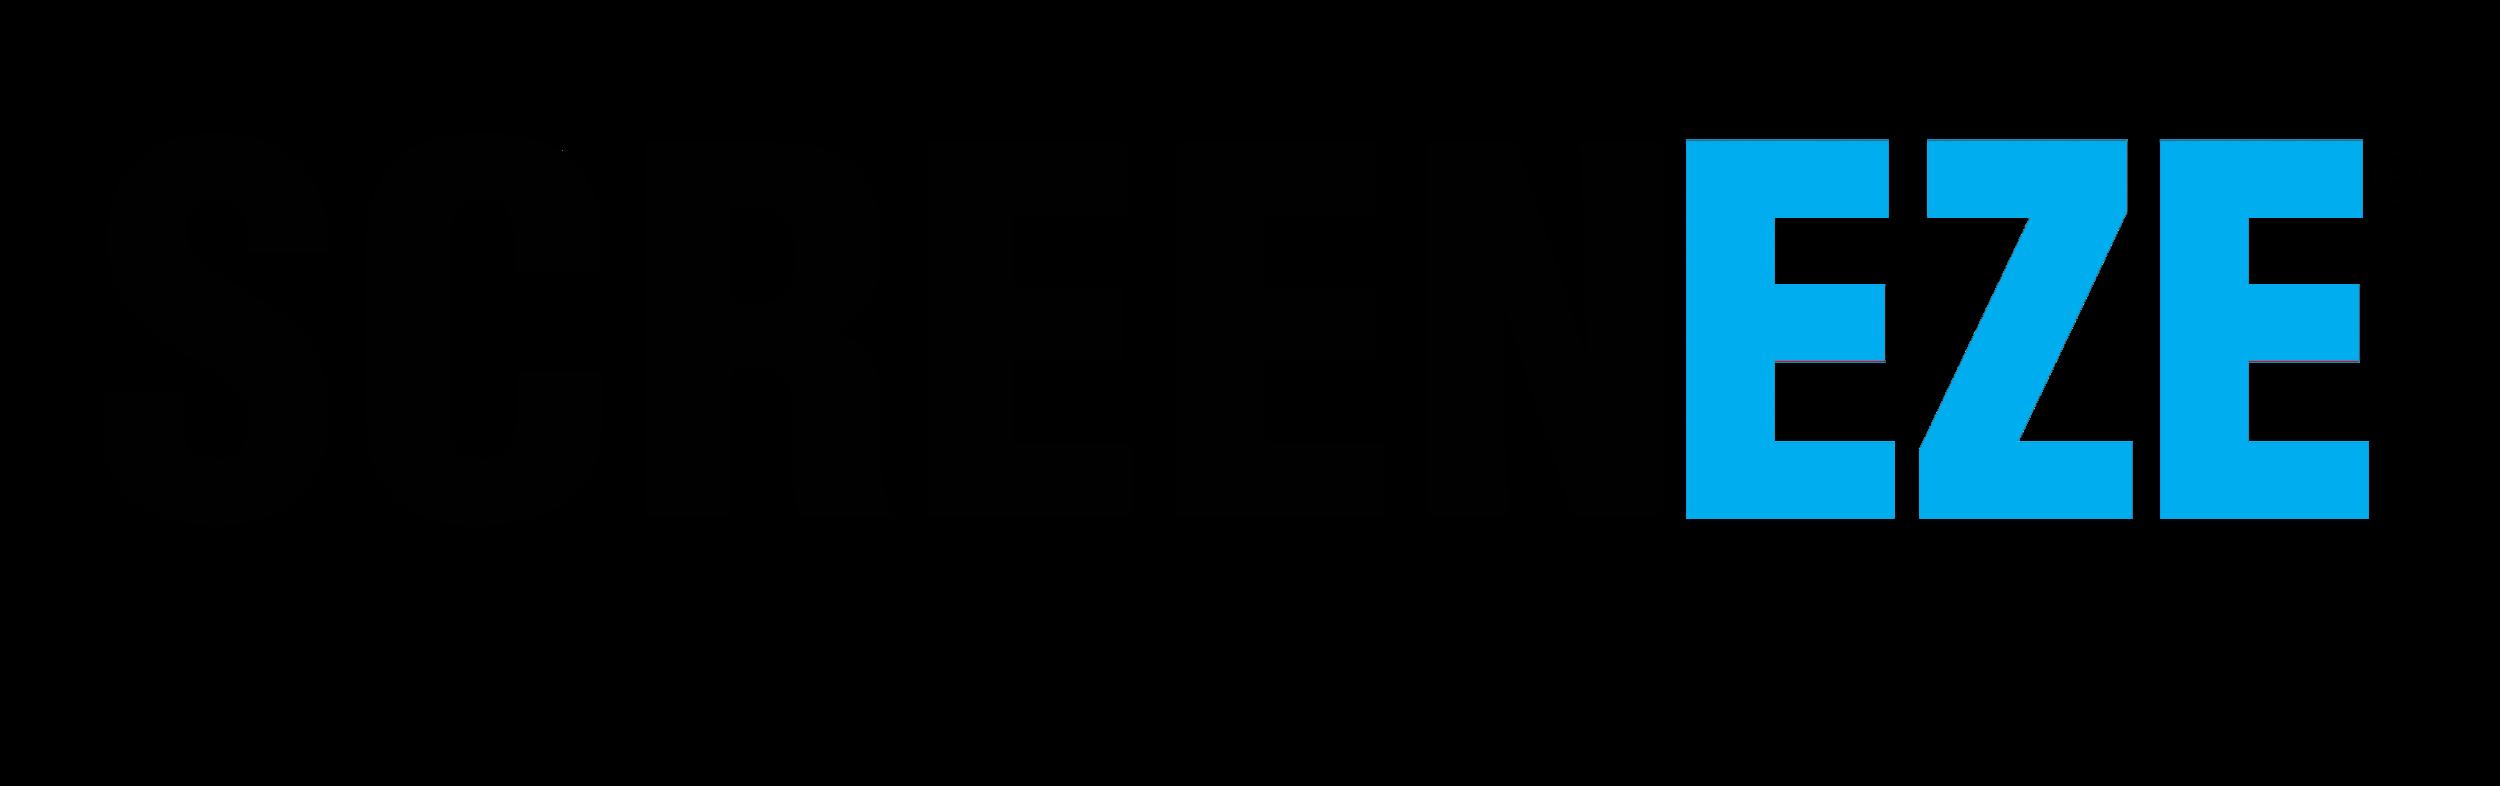 SCREENEZE logo blk - nospline.png